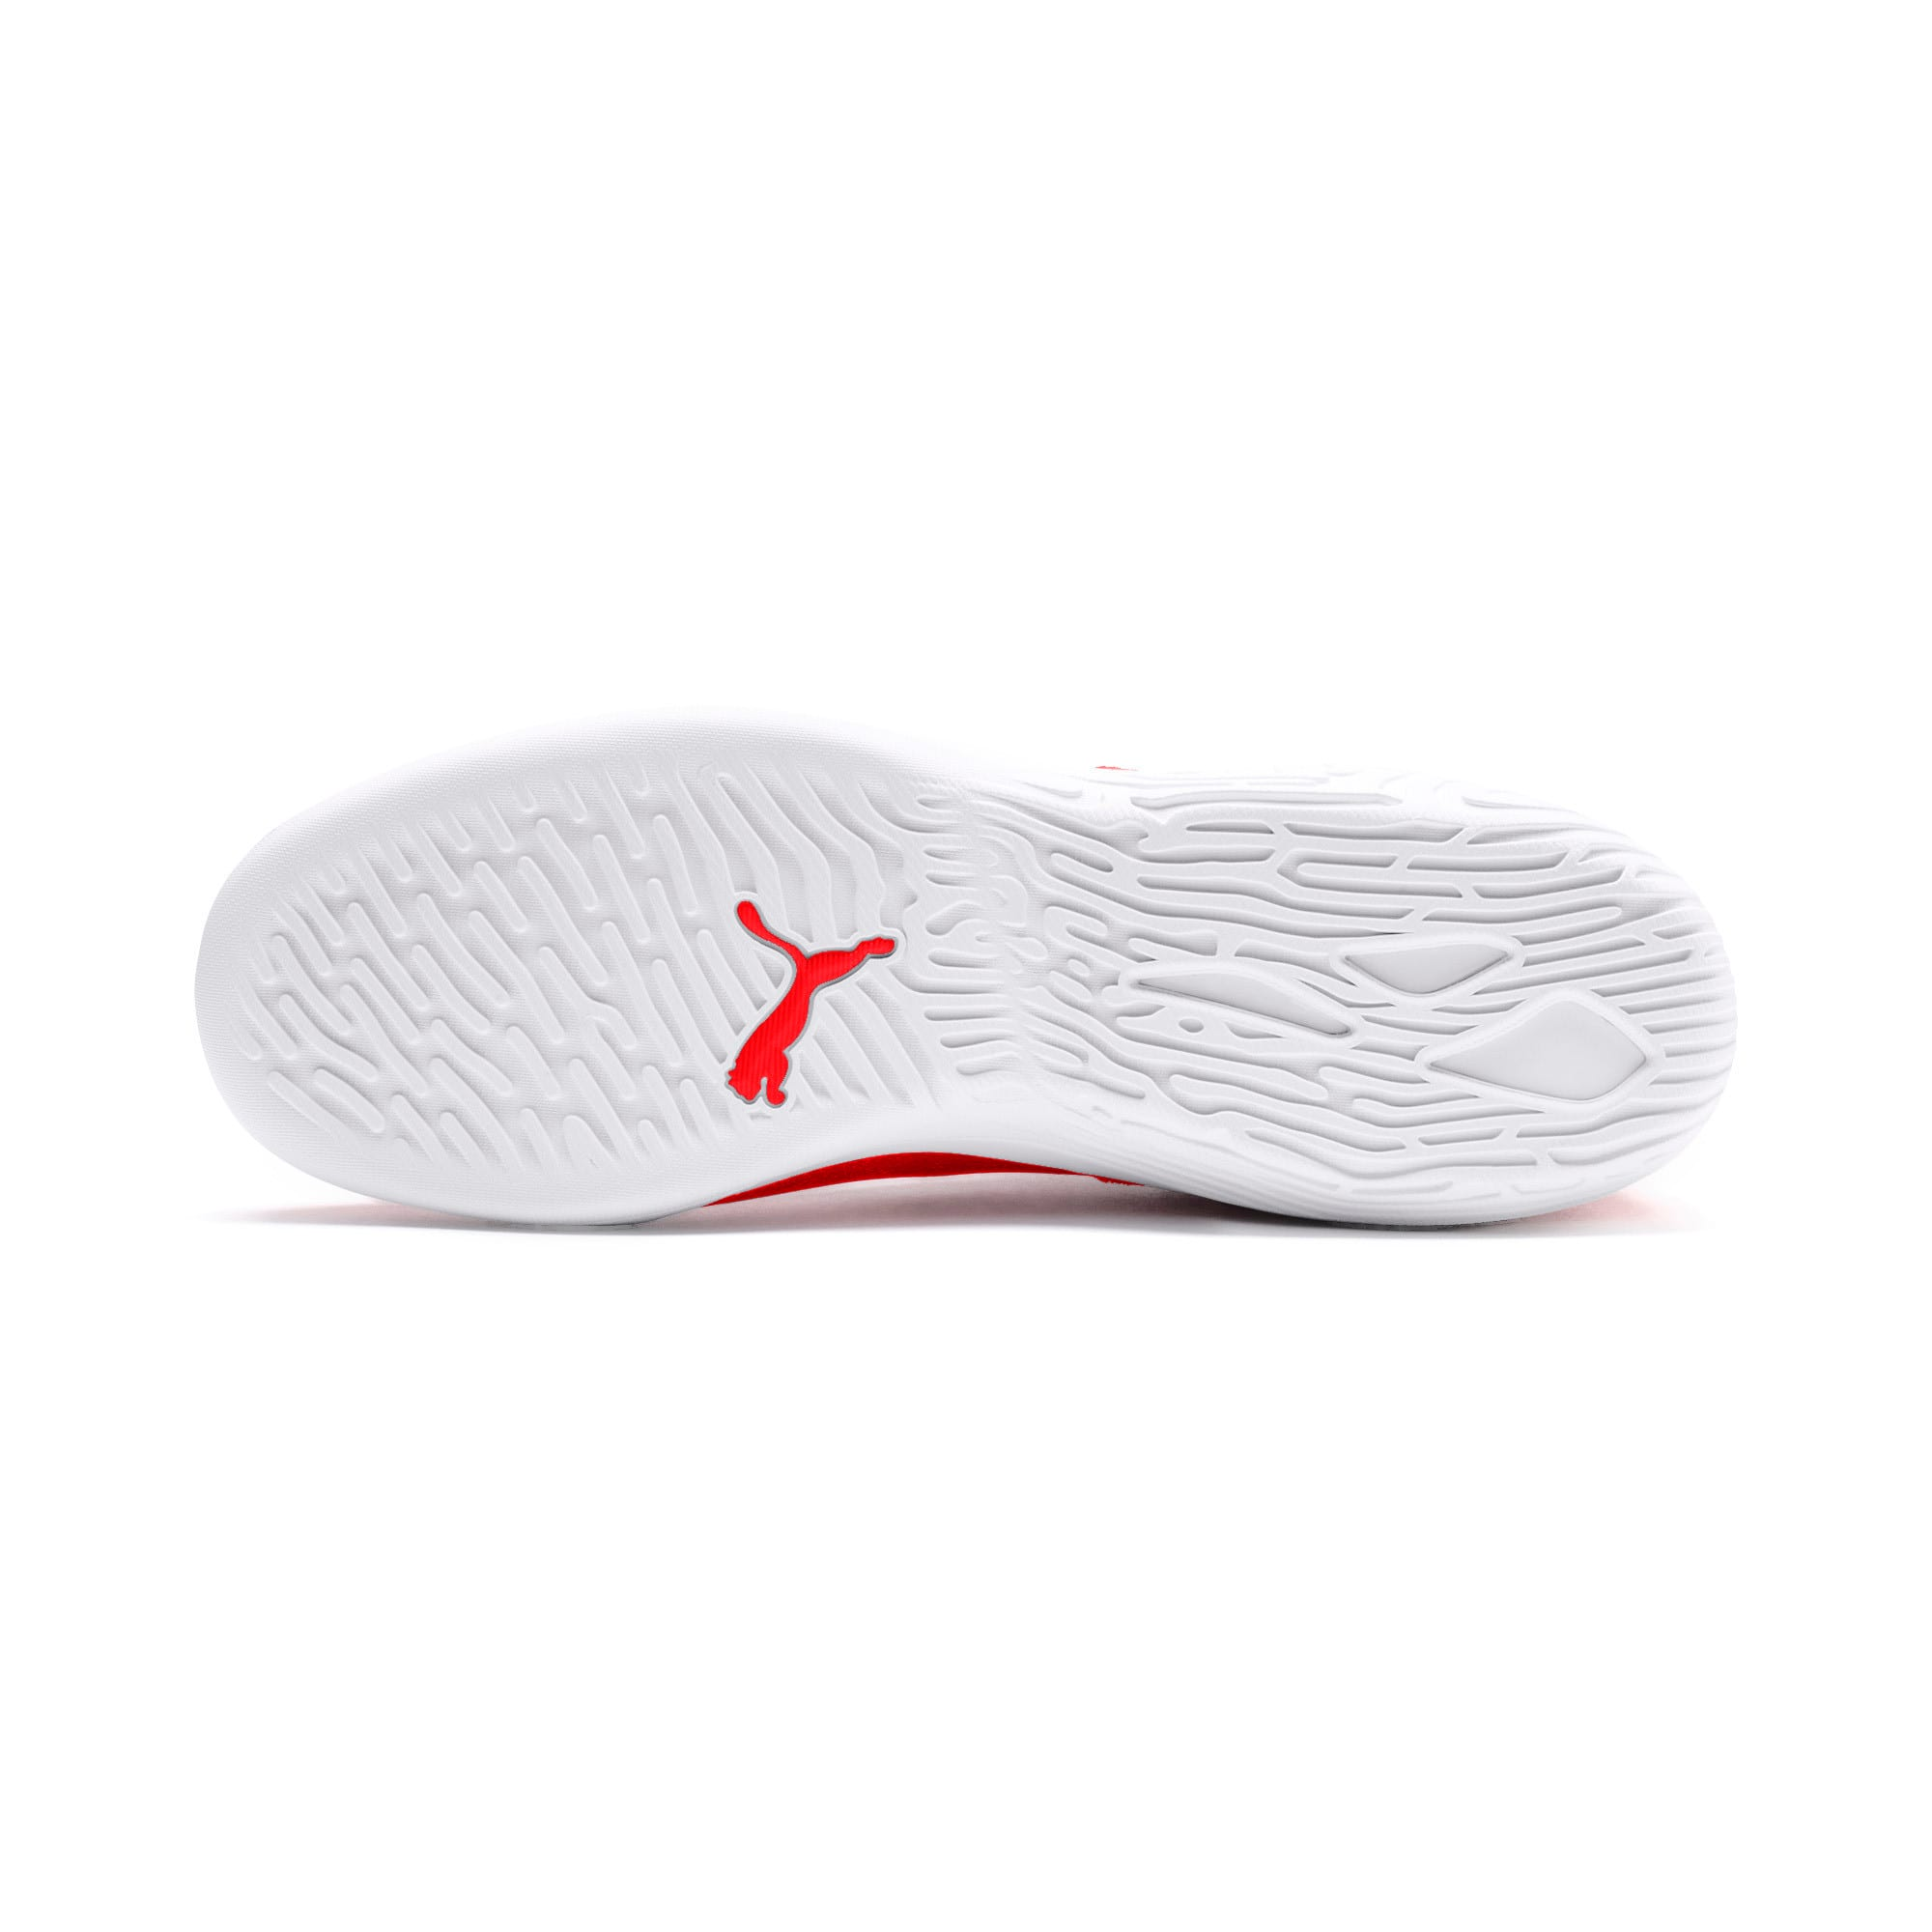 Thumbnail 3 of 365 IGNITE Fuse P 1 Men's Soccer Shoes, Red Blast-White-Puma Black, medium